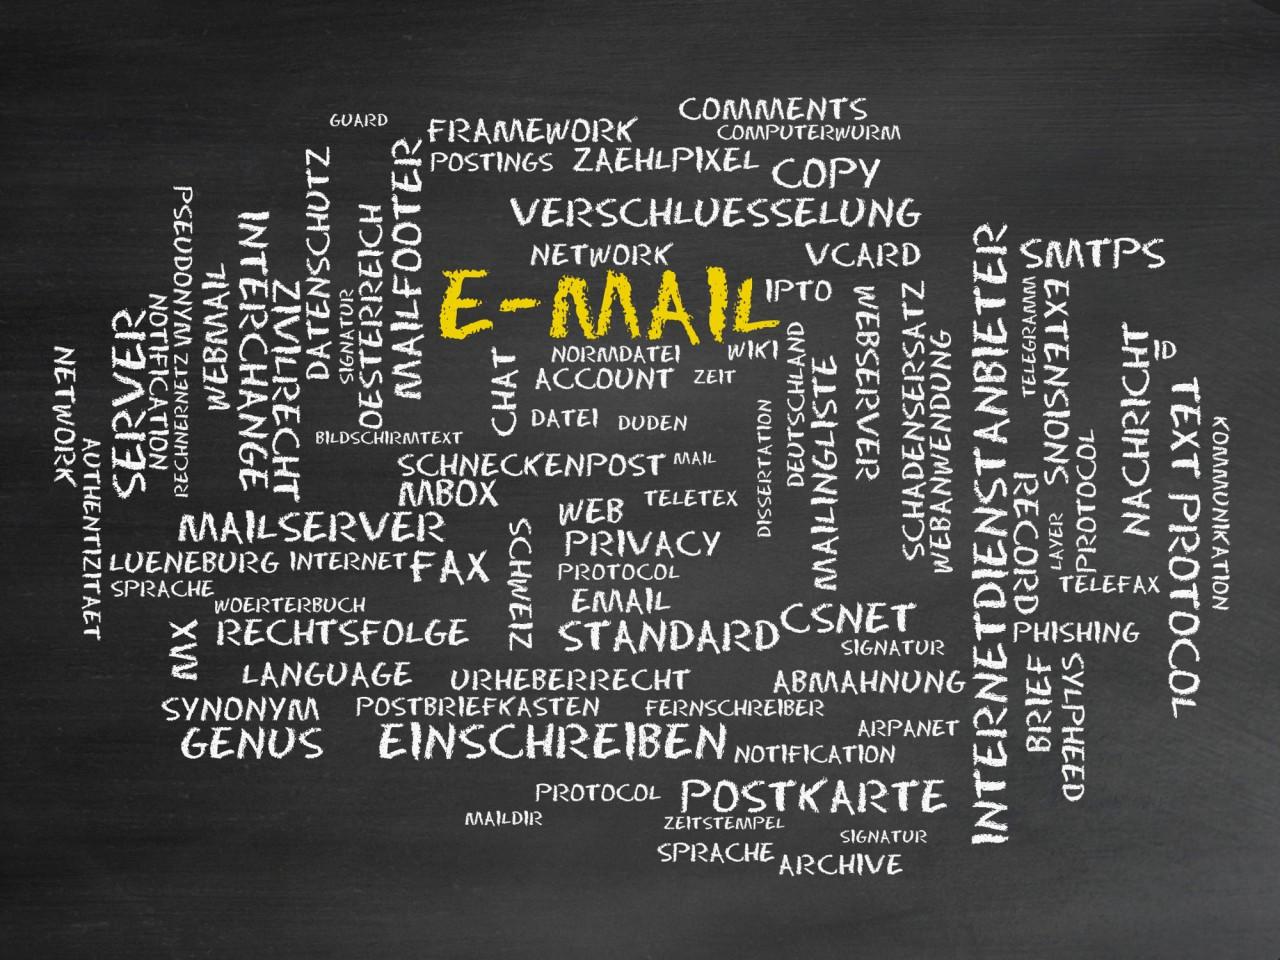 Zimbra - plataforma corporativa de e-mail